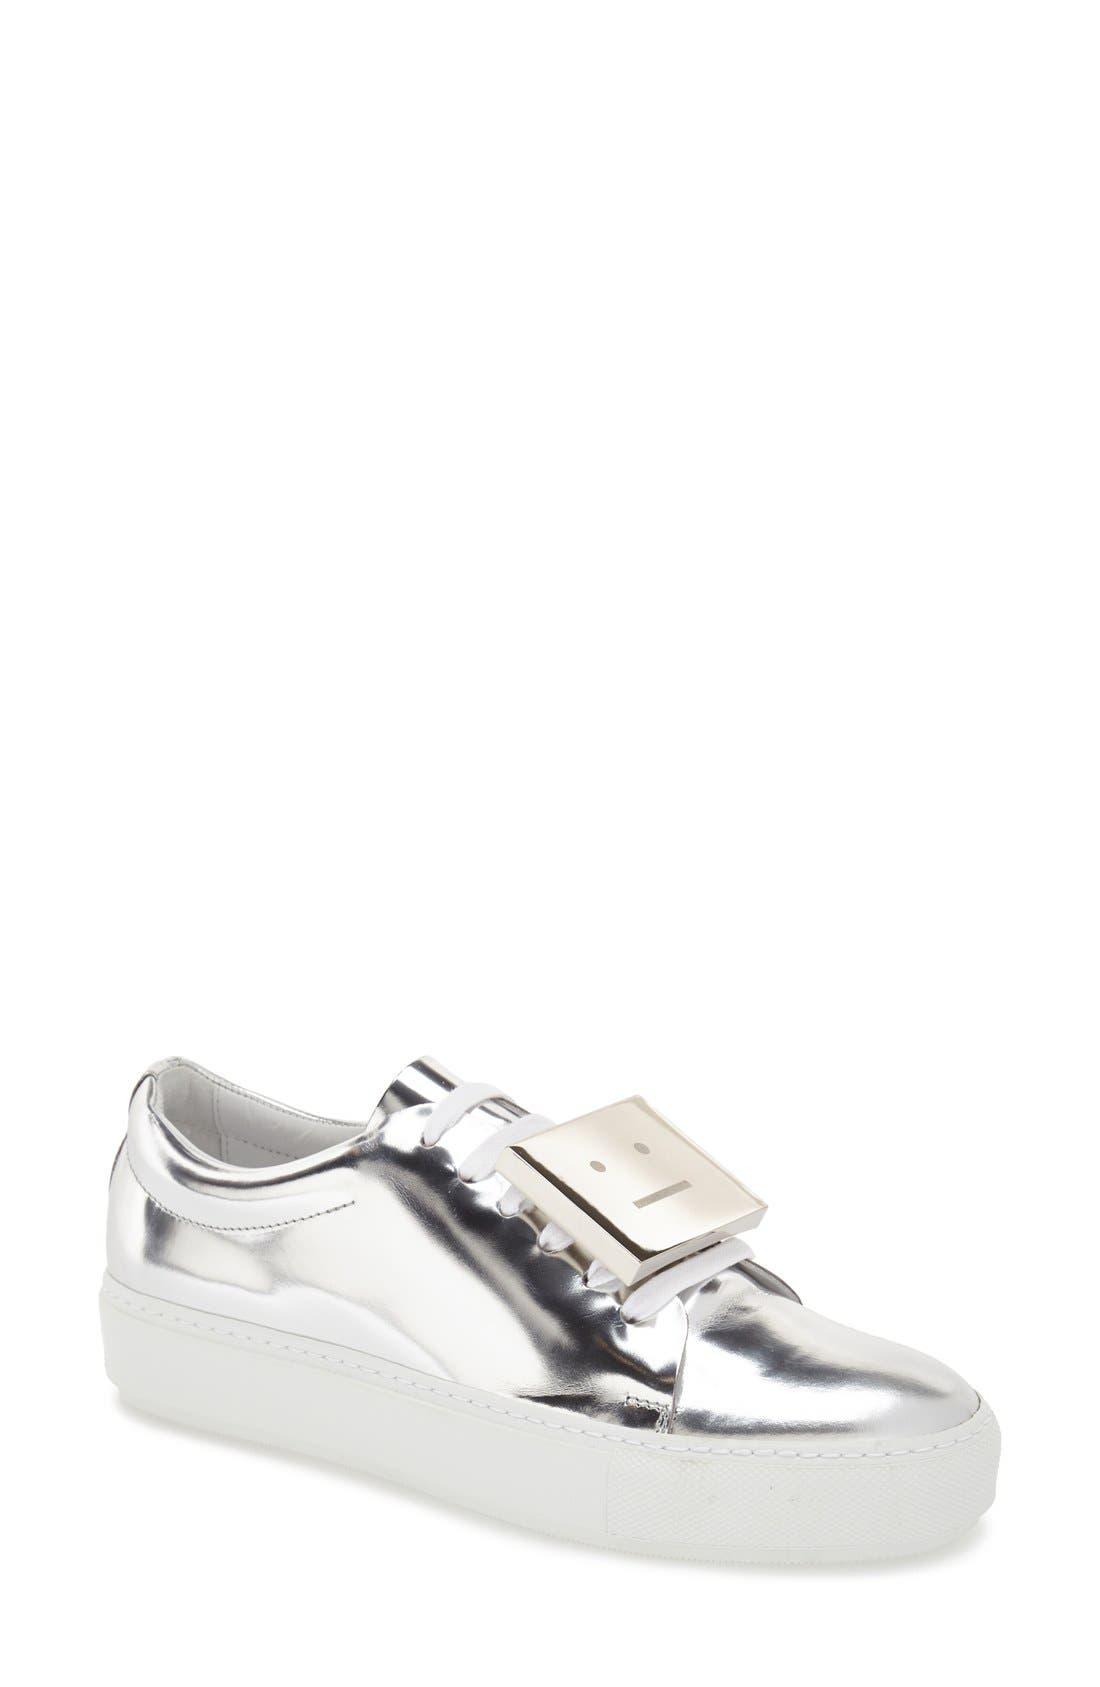 ACNE STUDIOS 'Adriana' Silver Metallic Sneaker